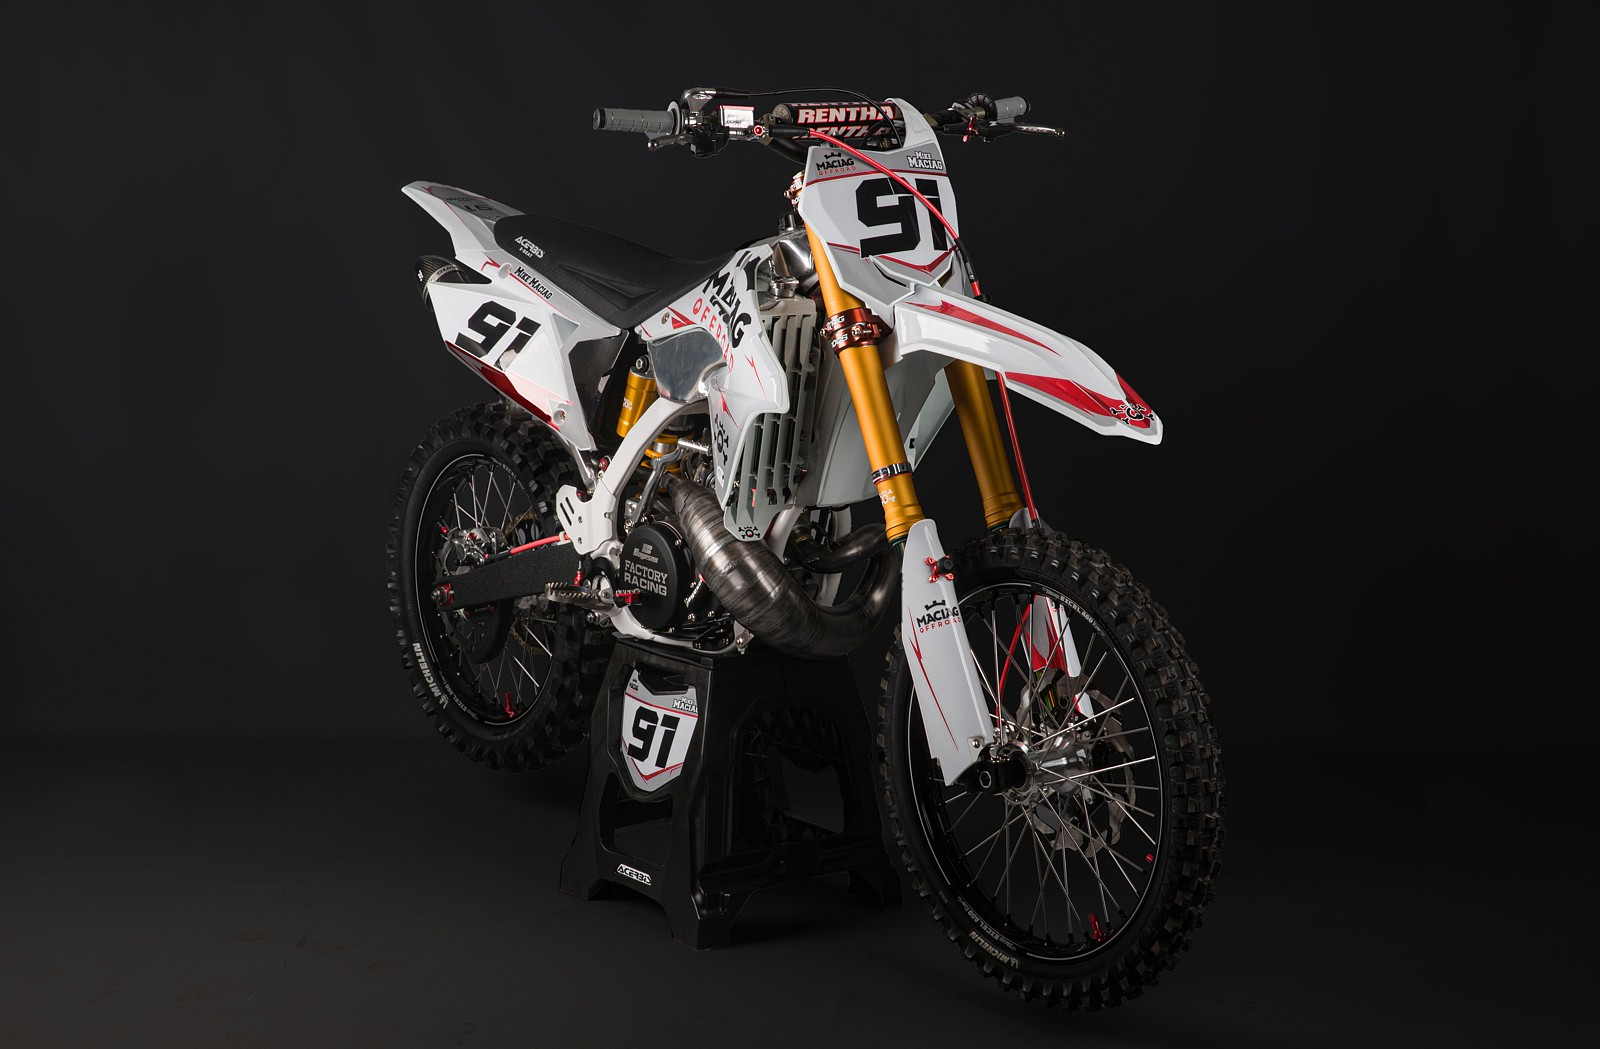 Suzuki RM 250 3 - Mike Maciag - Motocross Pictures - Vital MX